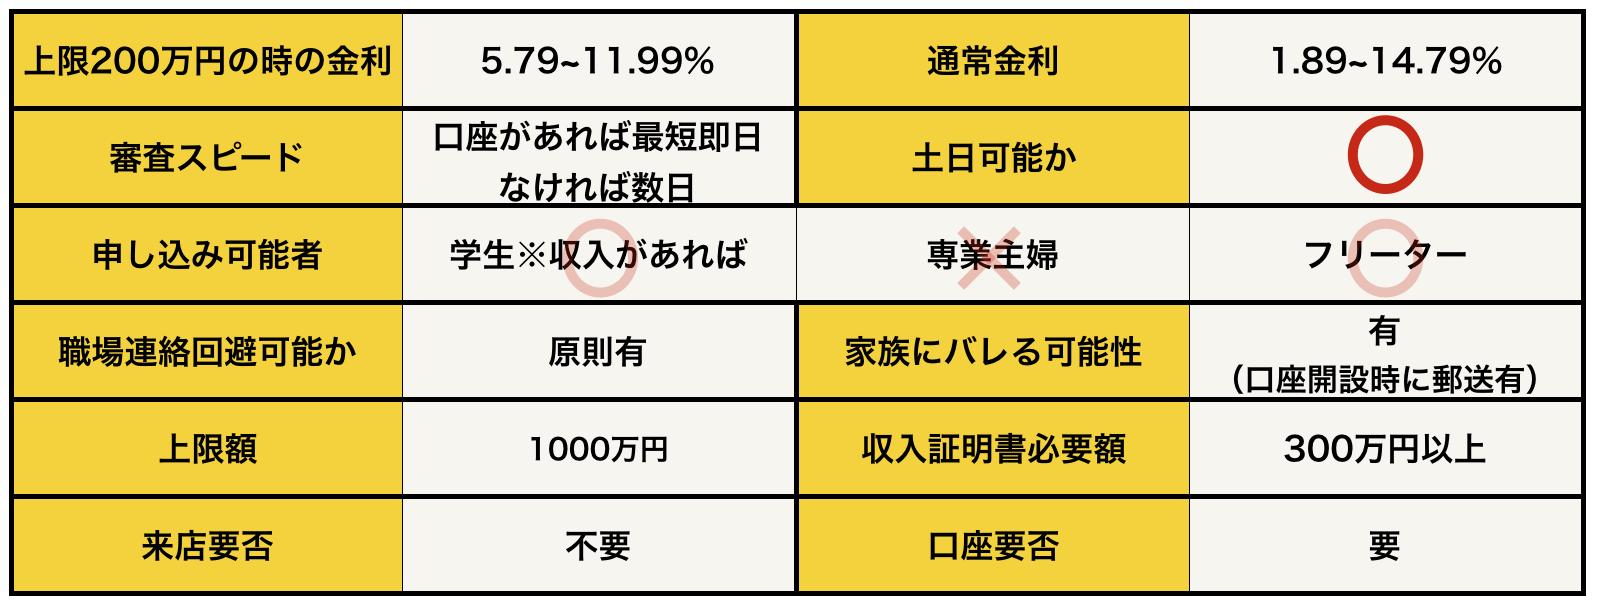 %e3%82%b9%e3%82%af%e3%83%aa%e3%83%bc%e3%83%b3%e3%82%b7%e3%83%a7%e3%83%83%e3%83%88-2016-10-24-20-43-46